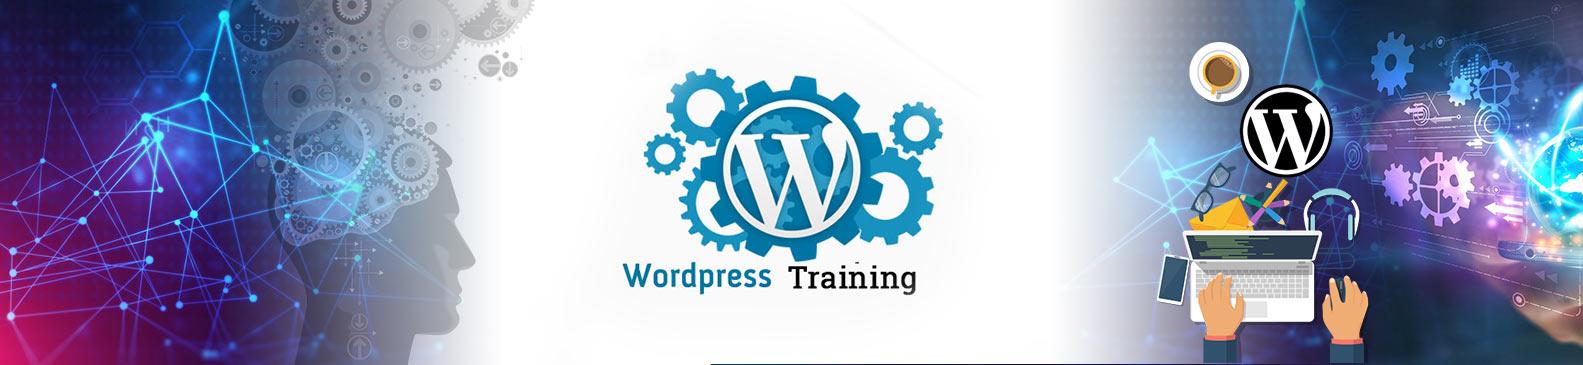 wordpress teacher training